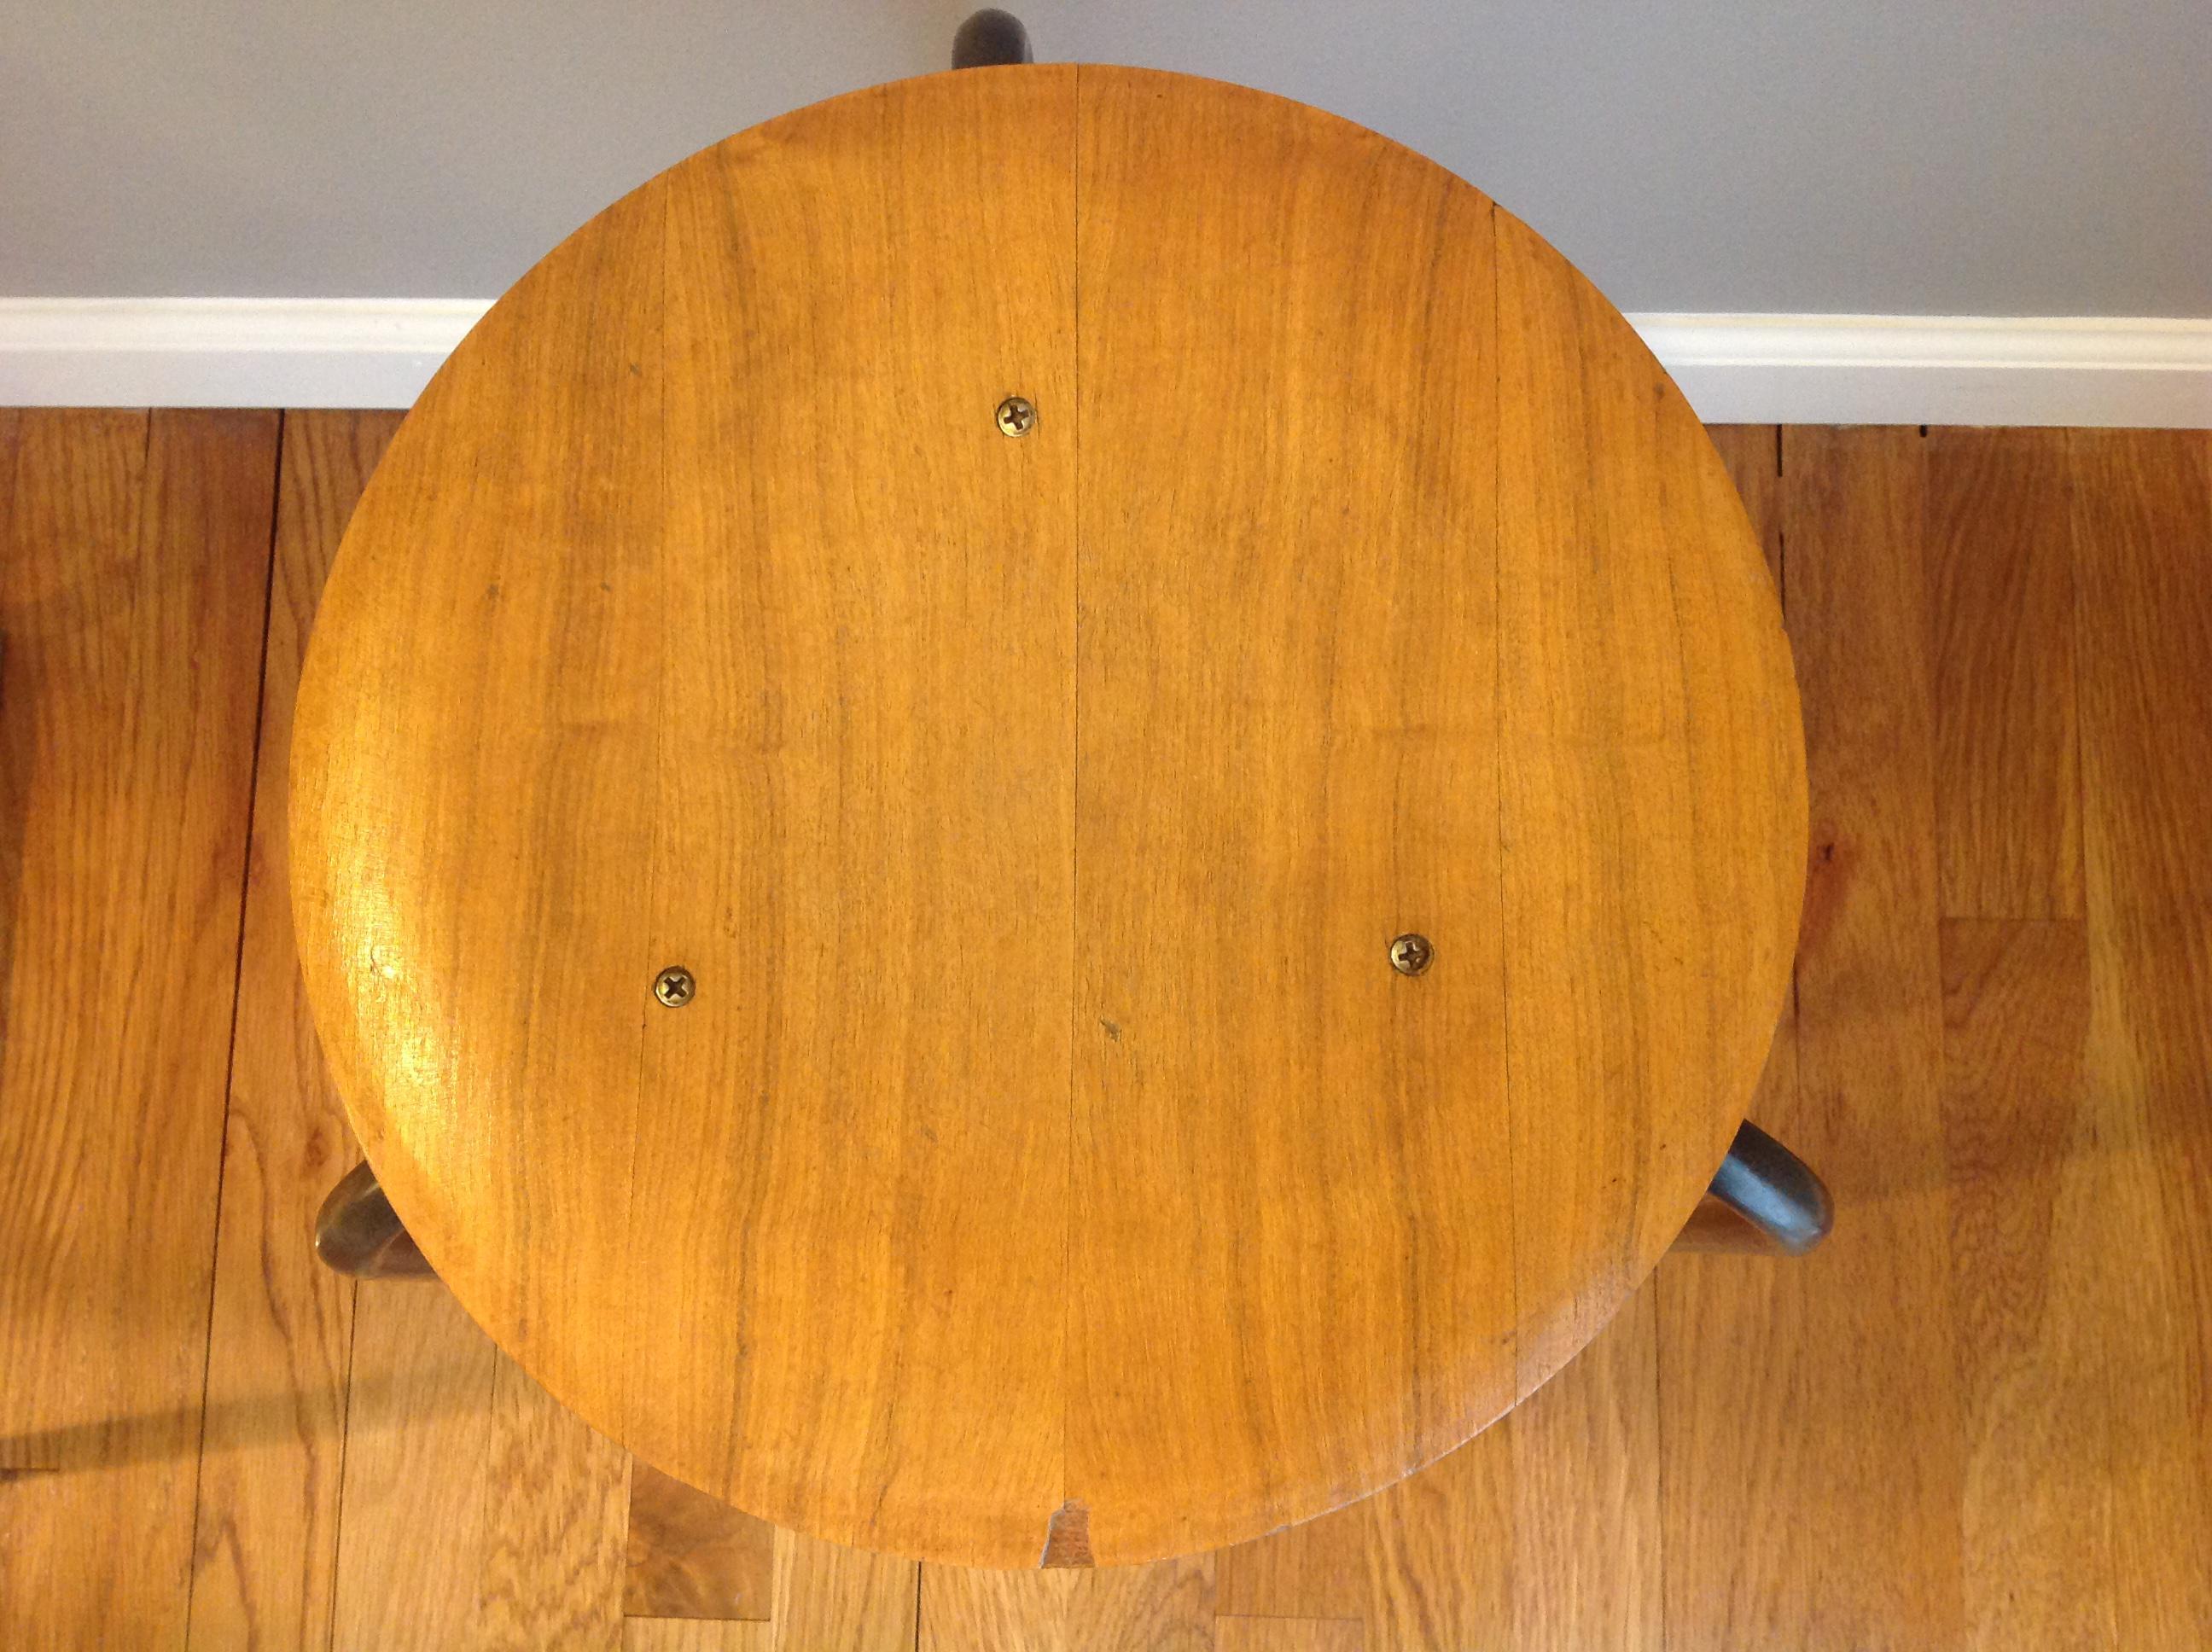 Arne Jacobsen Dot Stool Chairish